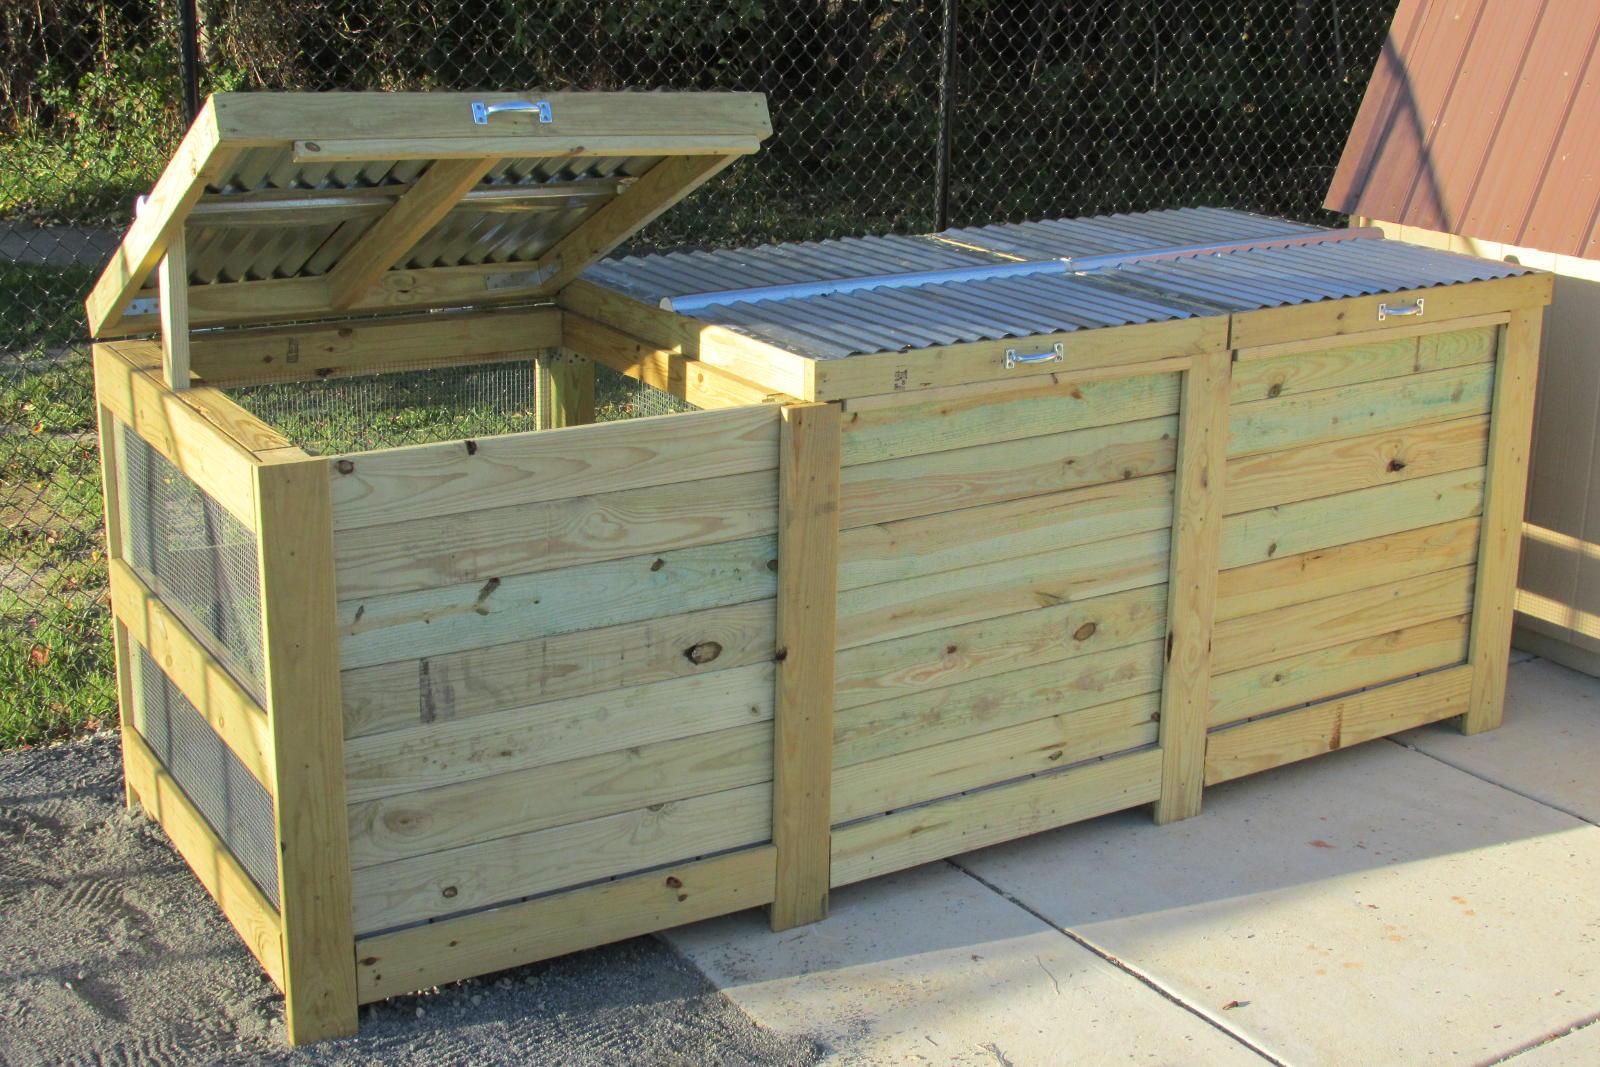 LoriBees Garden: Rat Update And A Compost Bin Retrofit